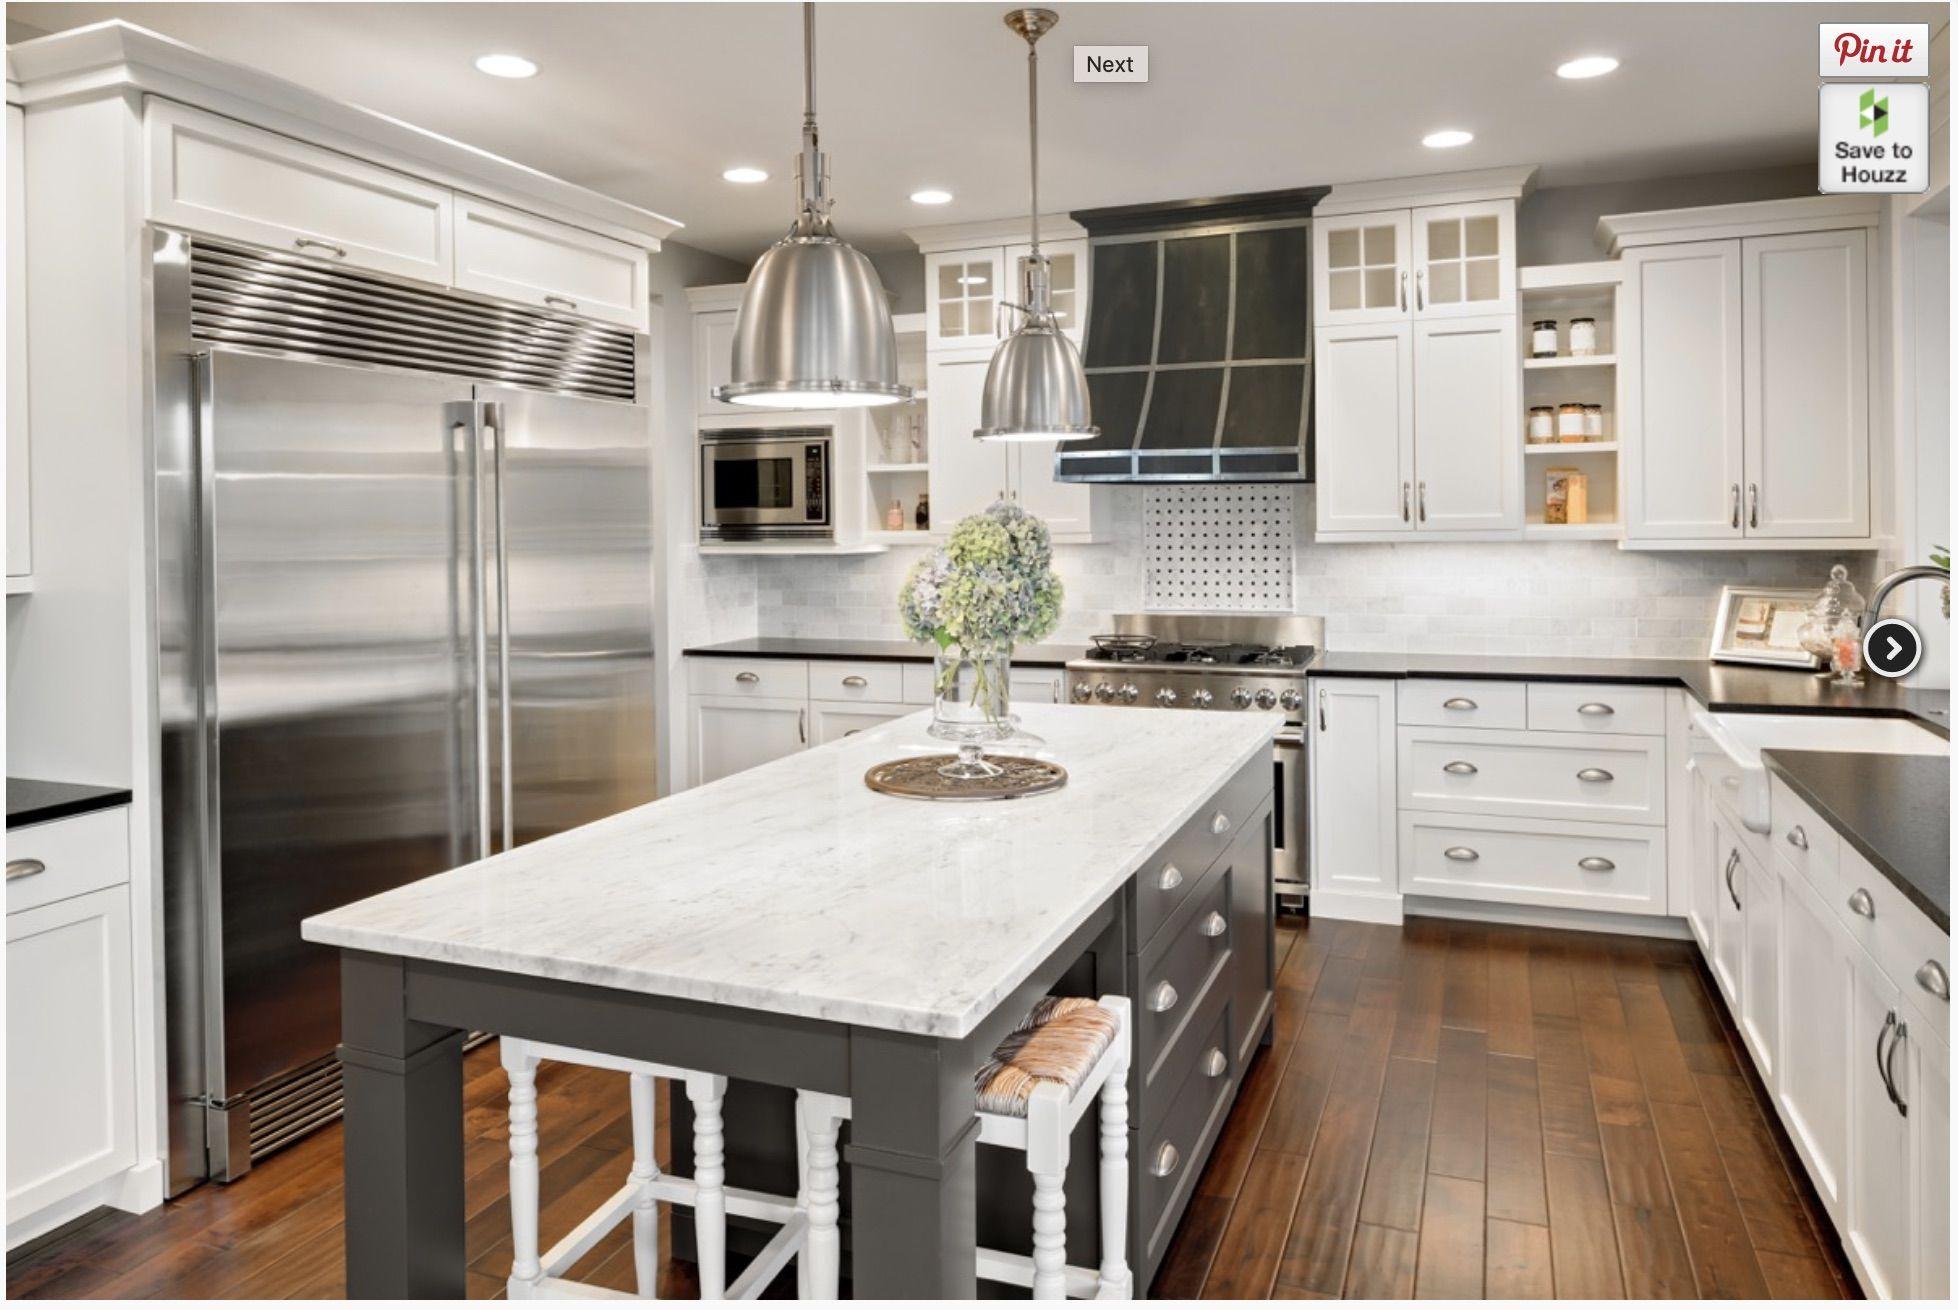 Contrast, range hood in 2020 Contrasting kitchen island